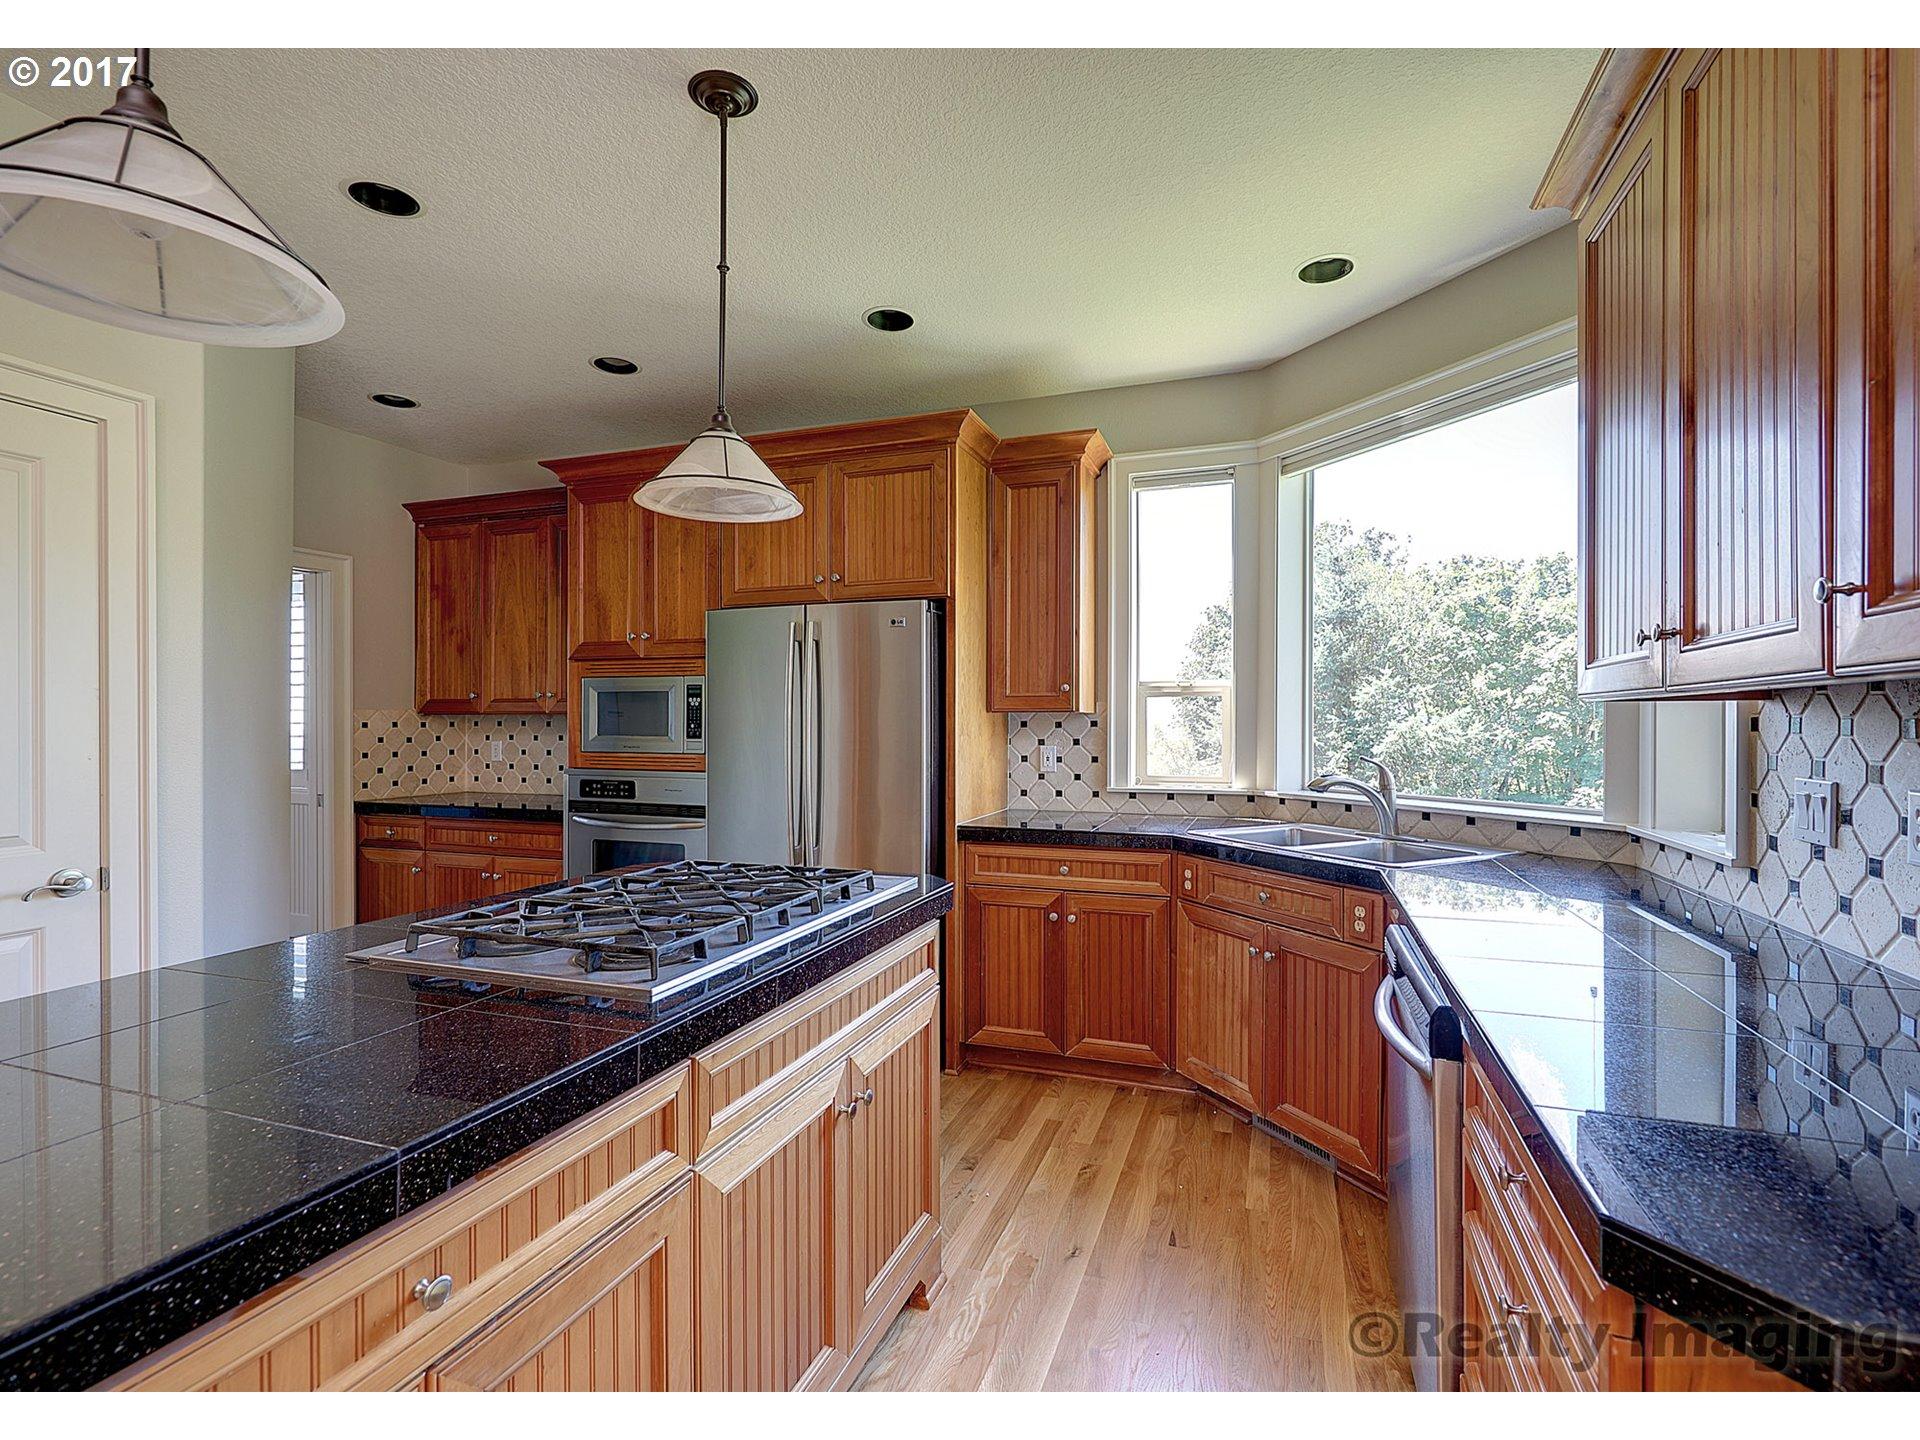 2819 NW BIRKENDENE ST Portland, OR 97229 - MLS #: 17476417